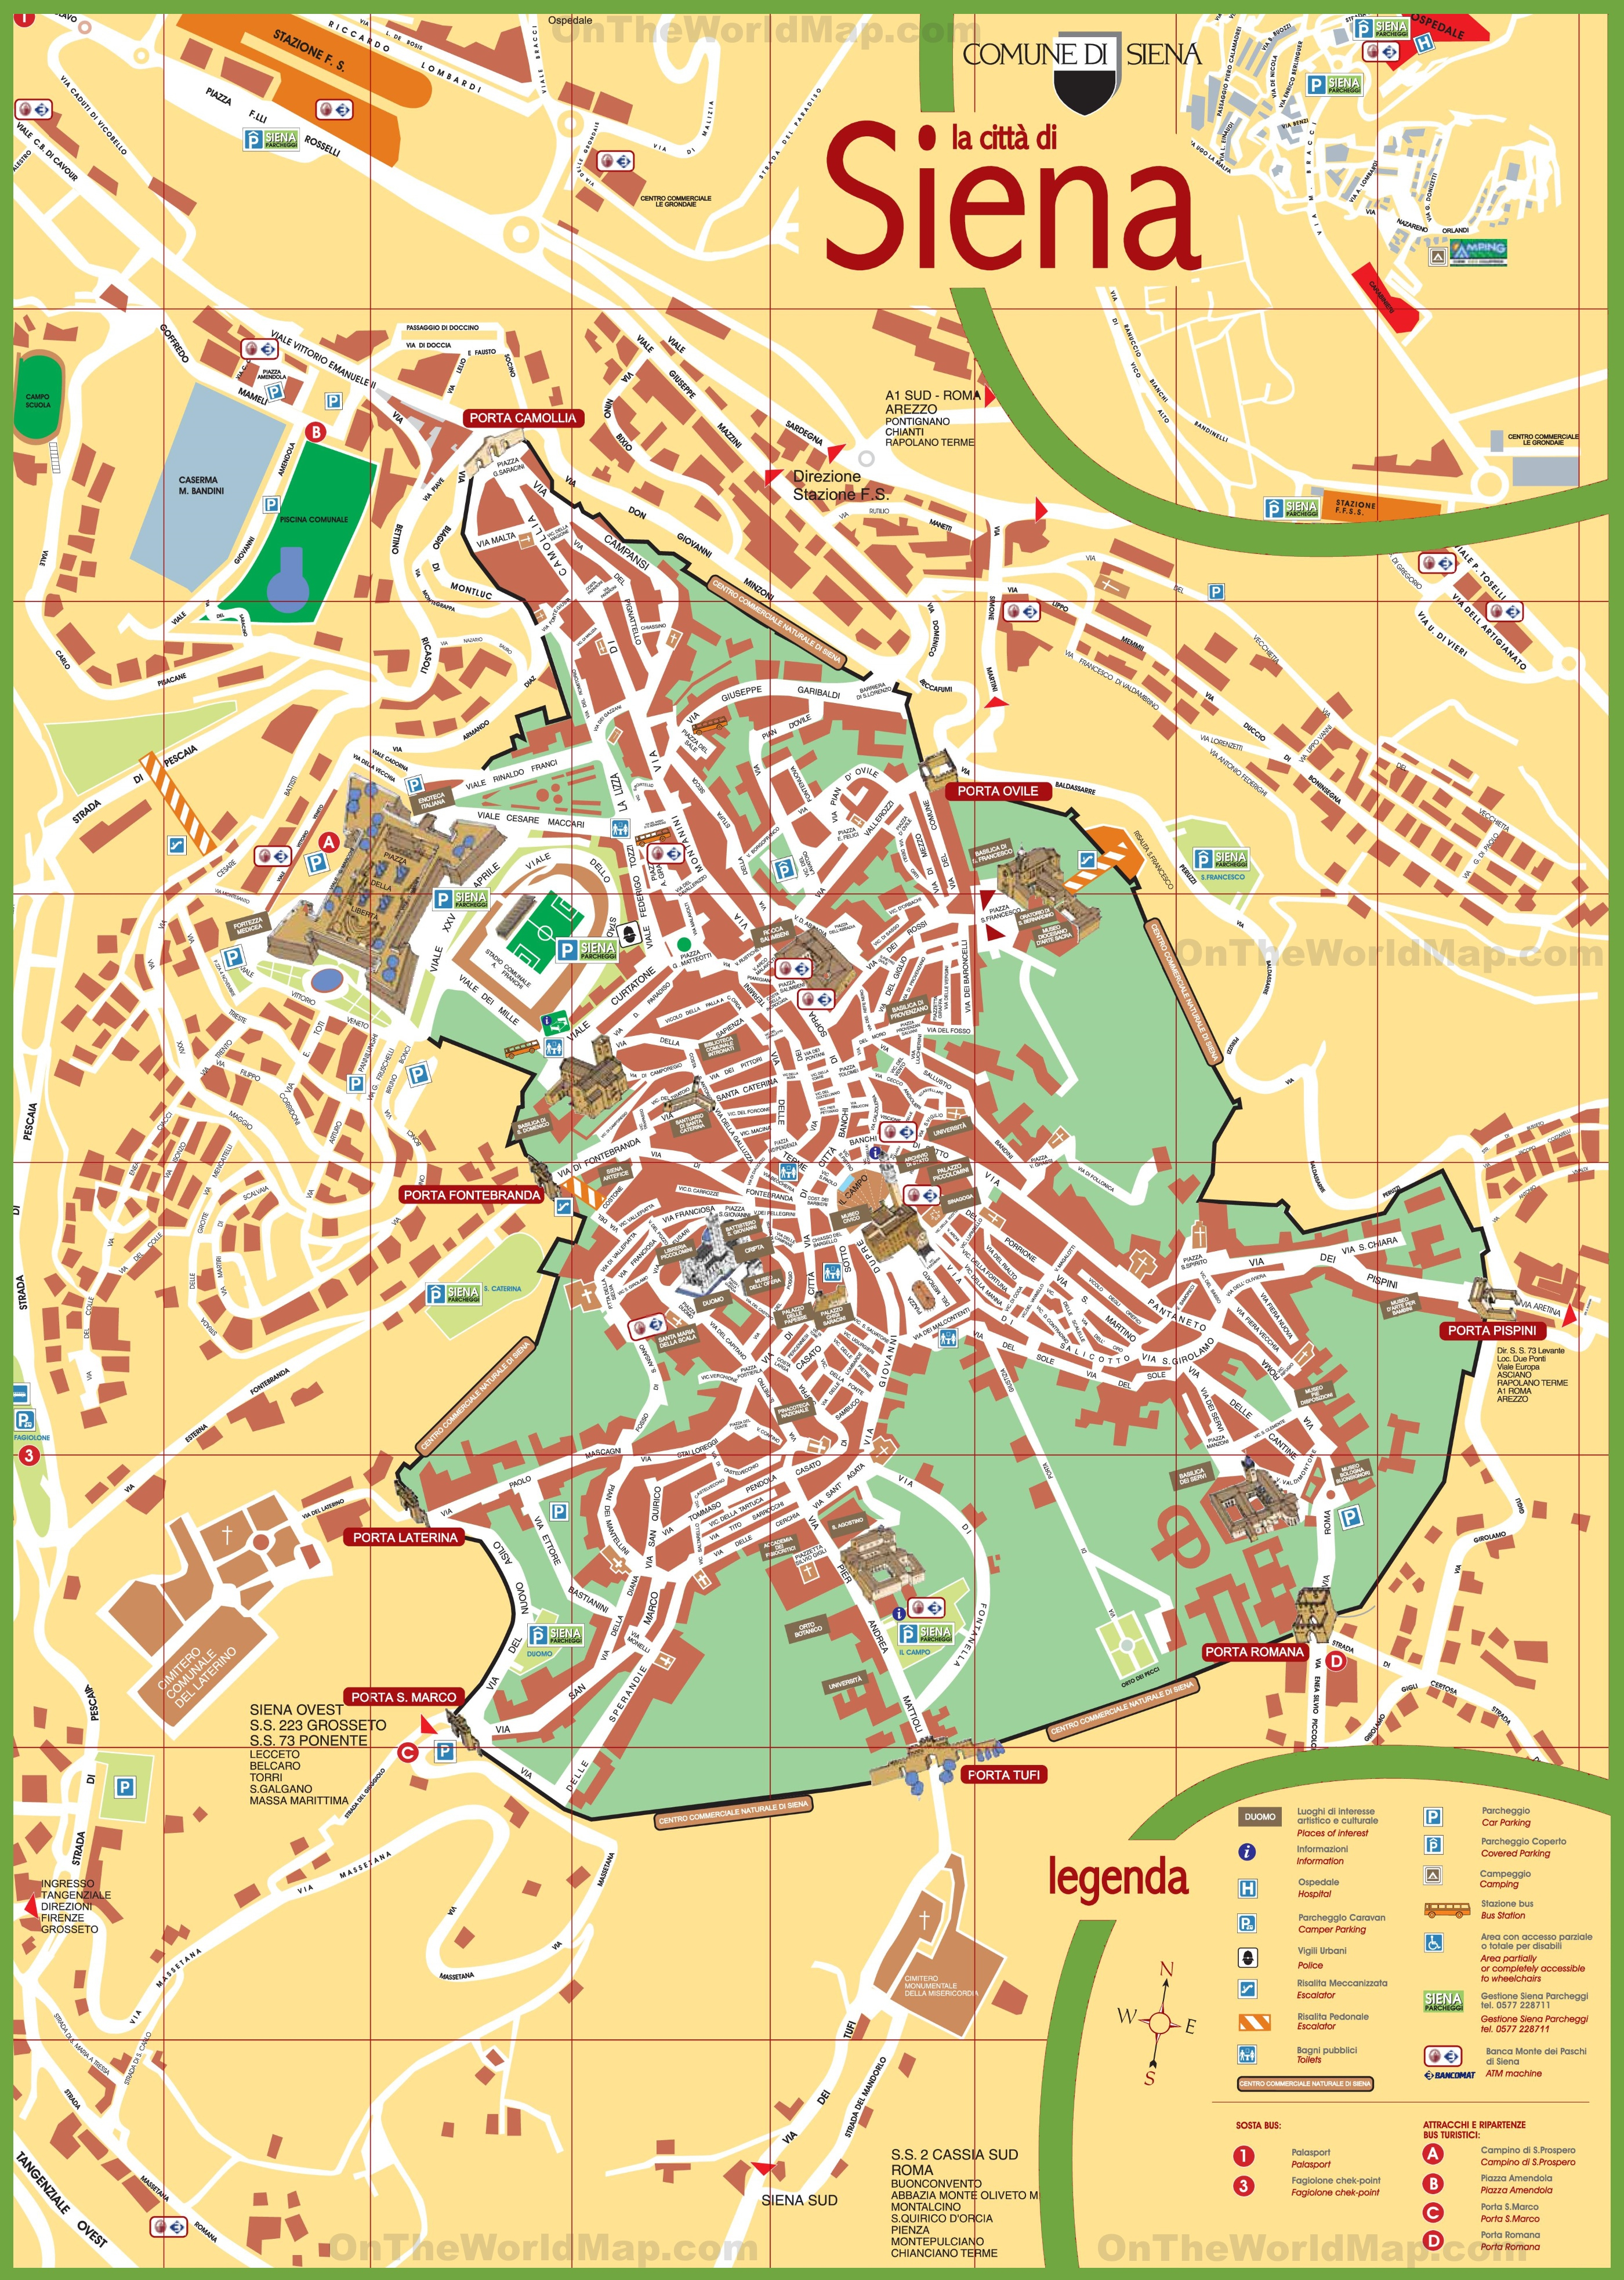 Siena Tourist Map - Sienna Texas Map